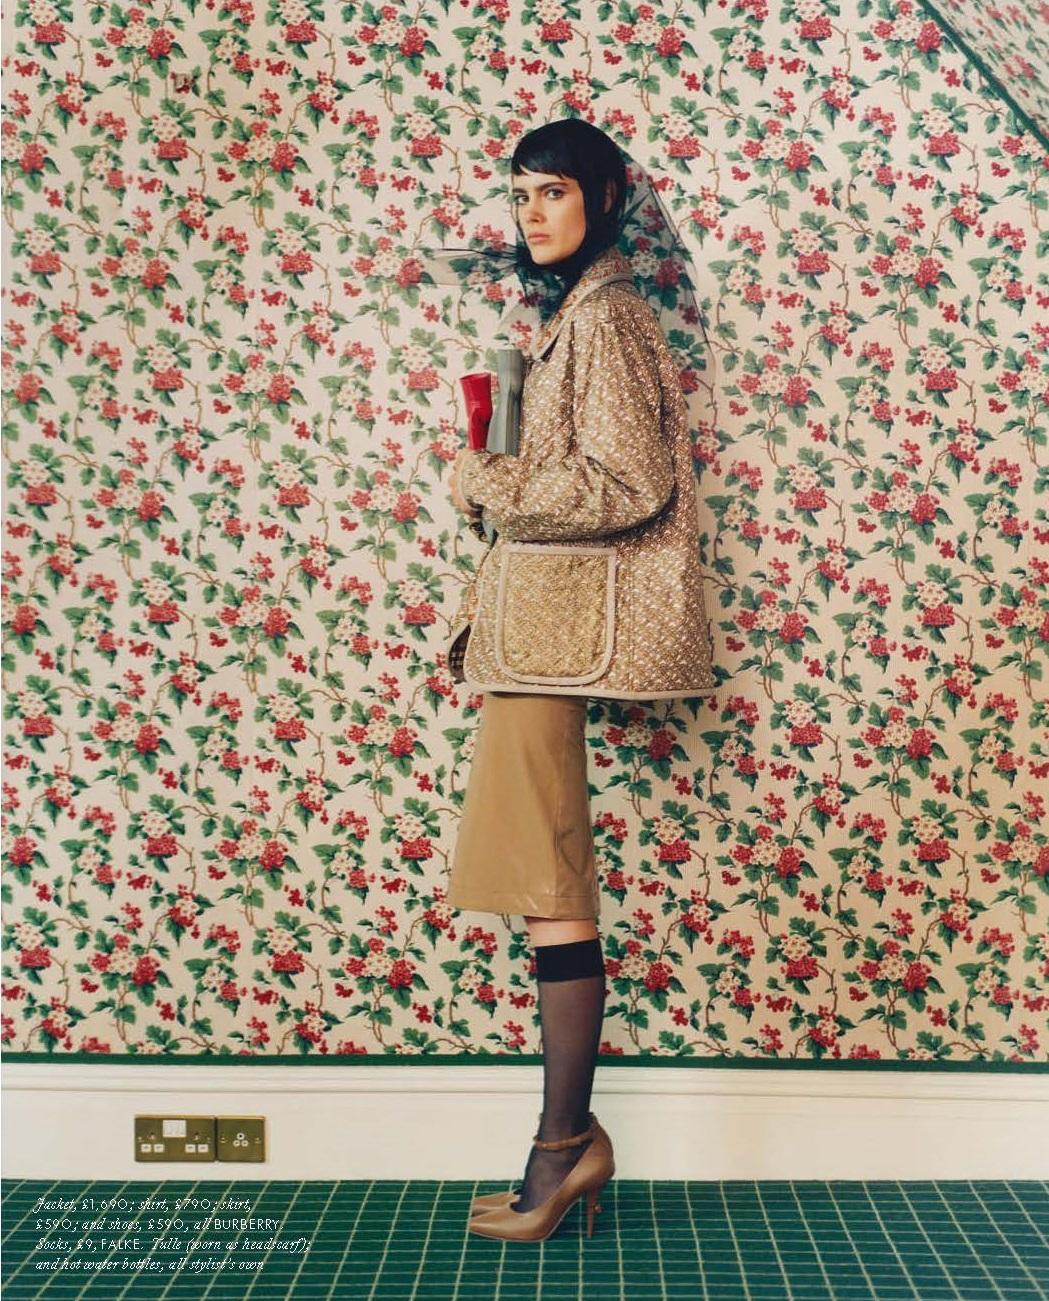 Taja Feistner by Alexander Saladrigas for British Elle (9).jpg